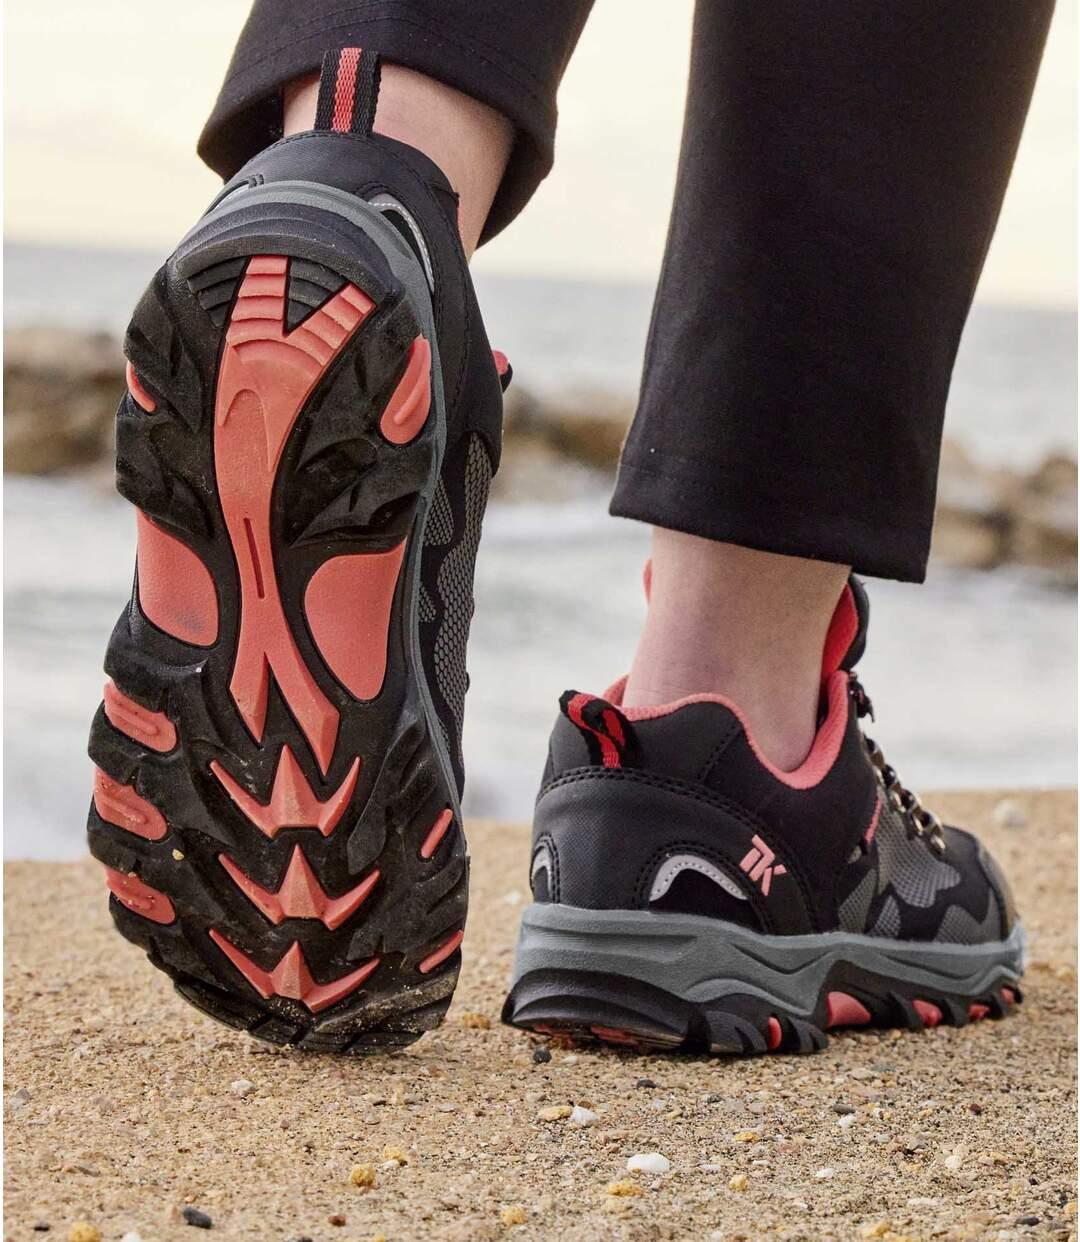 Chaussures de Rando Femme Tige Basse Atlas For Men